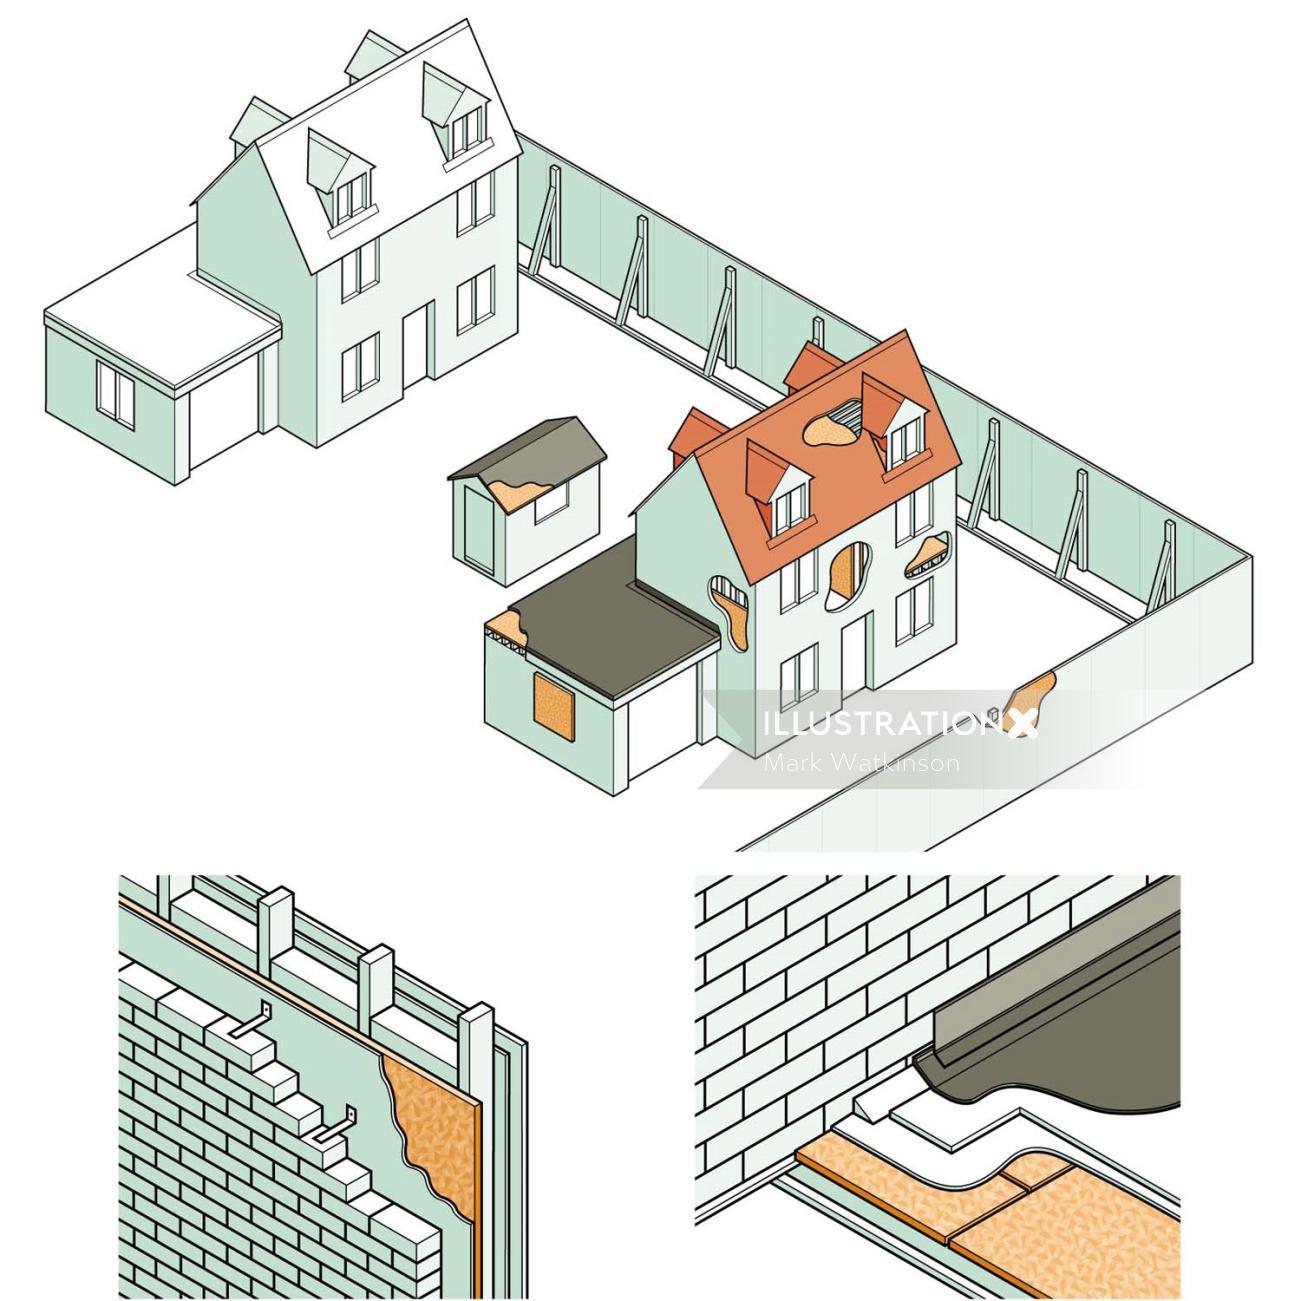 Infographic illustration of timber bricks